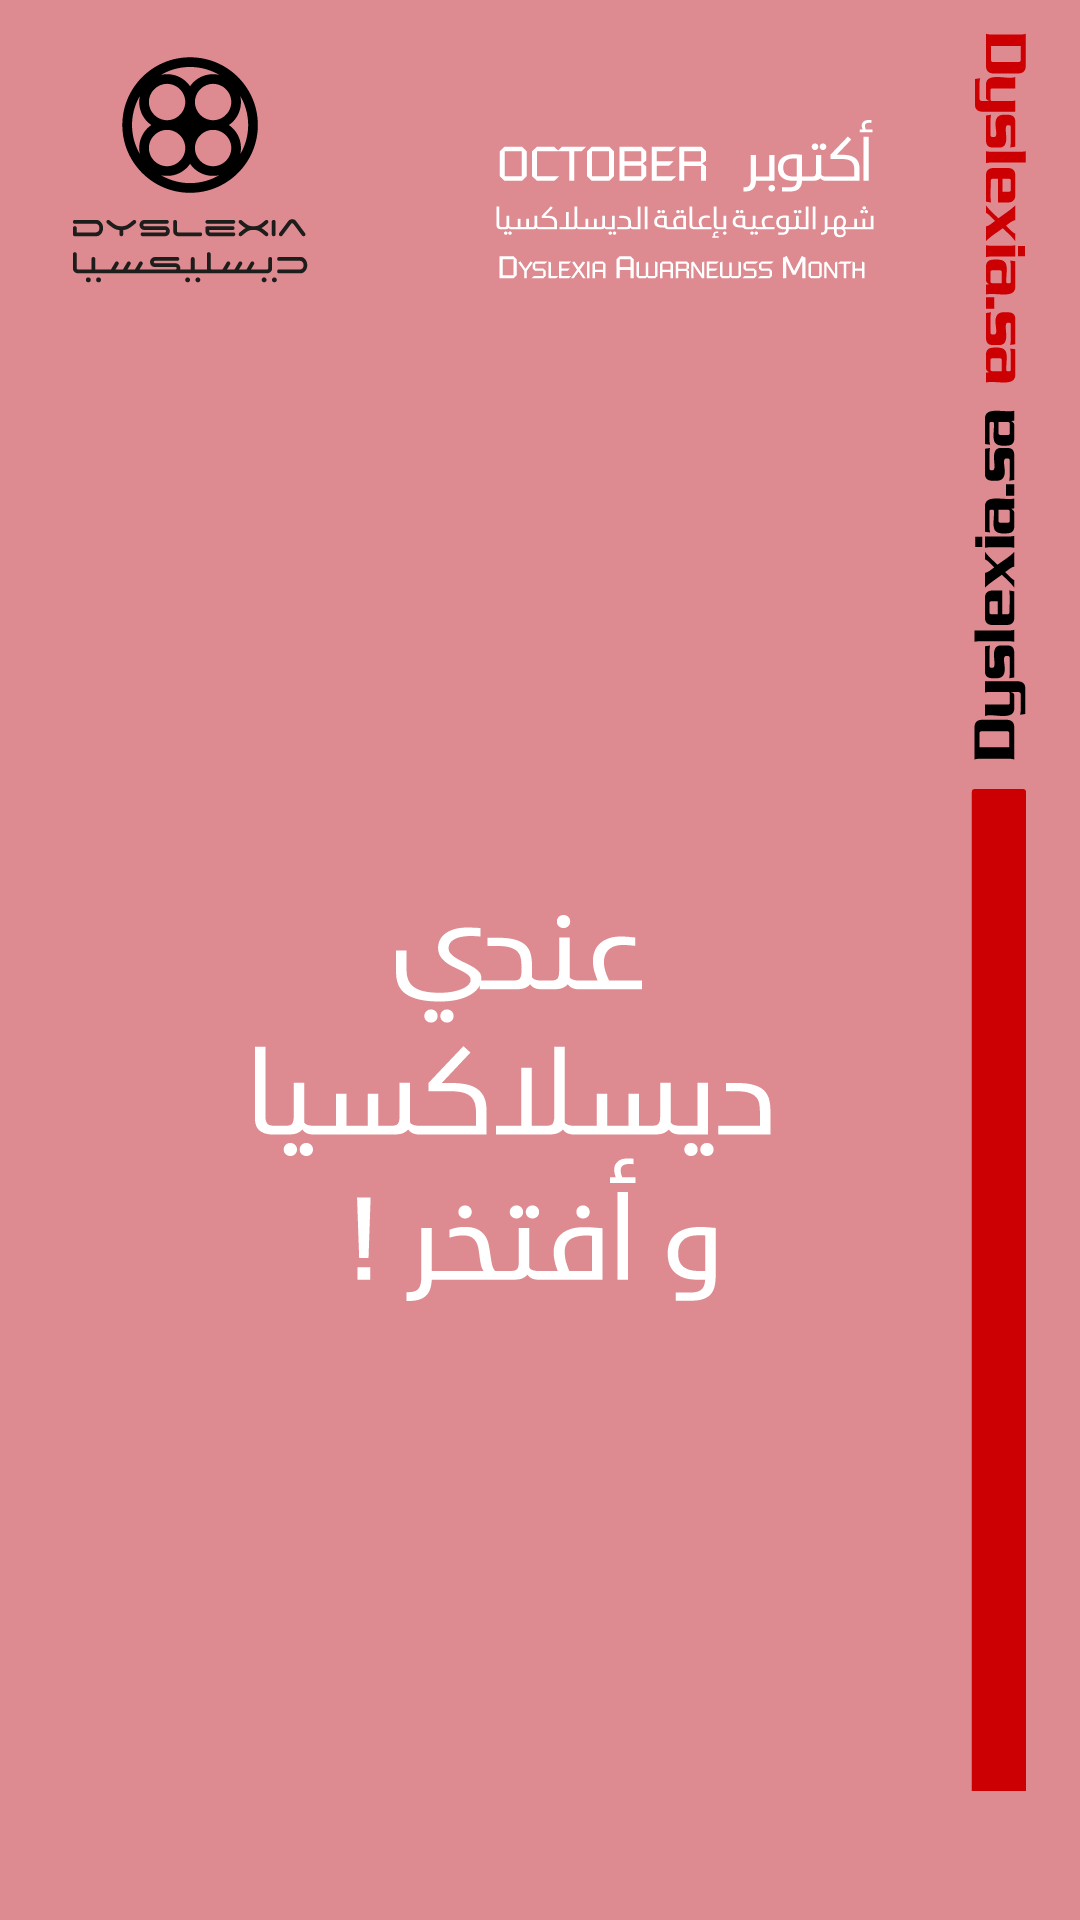 dyslexia-geofilter-may-3rd4